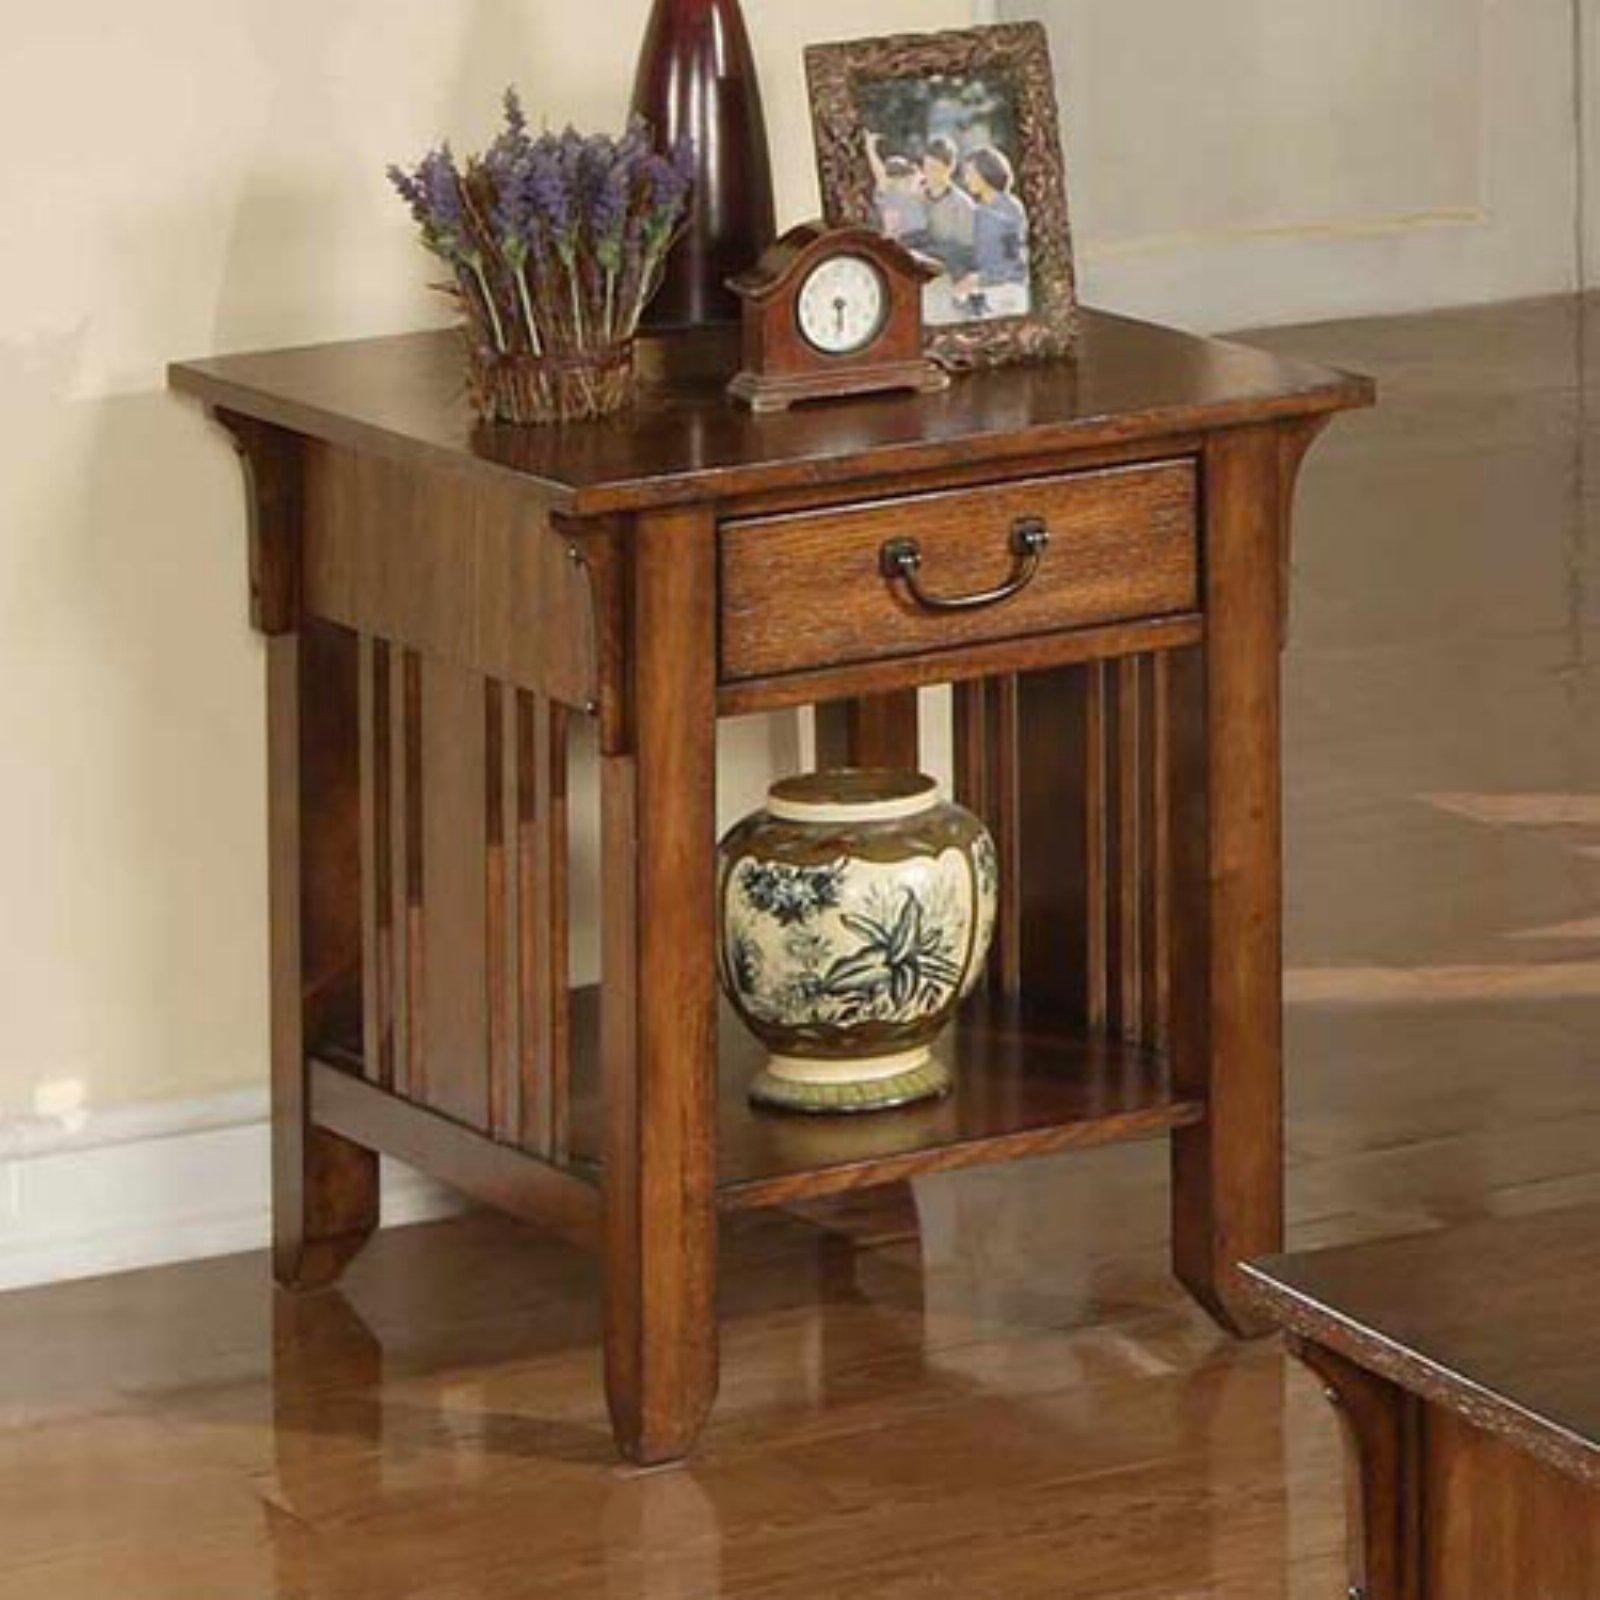 Zahara 1 Drawer End Table - Mission Oak